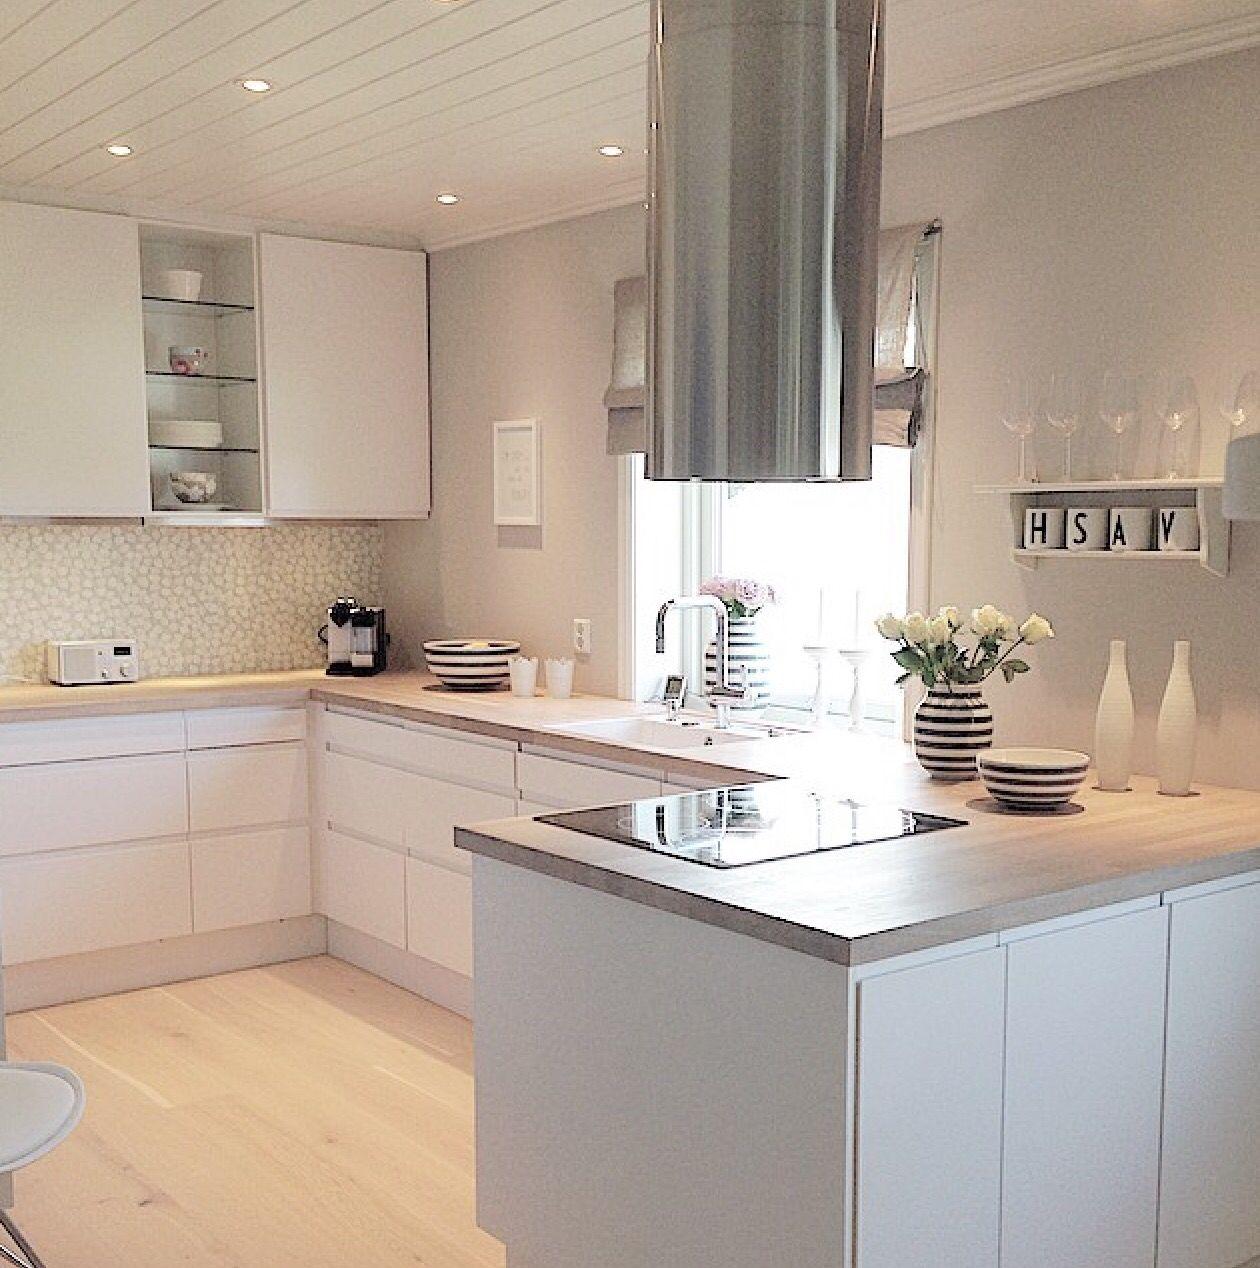 Pinterest: @claudiagabg  Cocinas de casa, Decoración de cocina